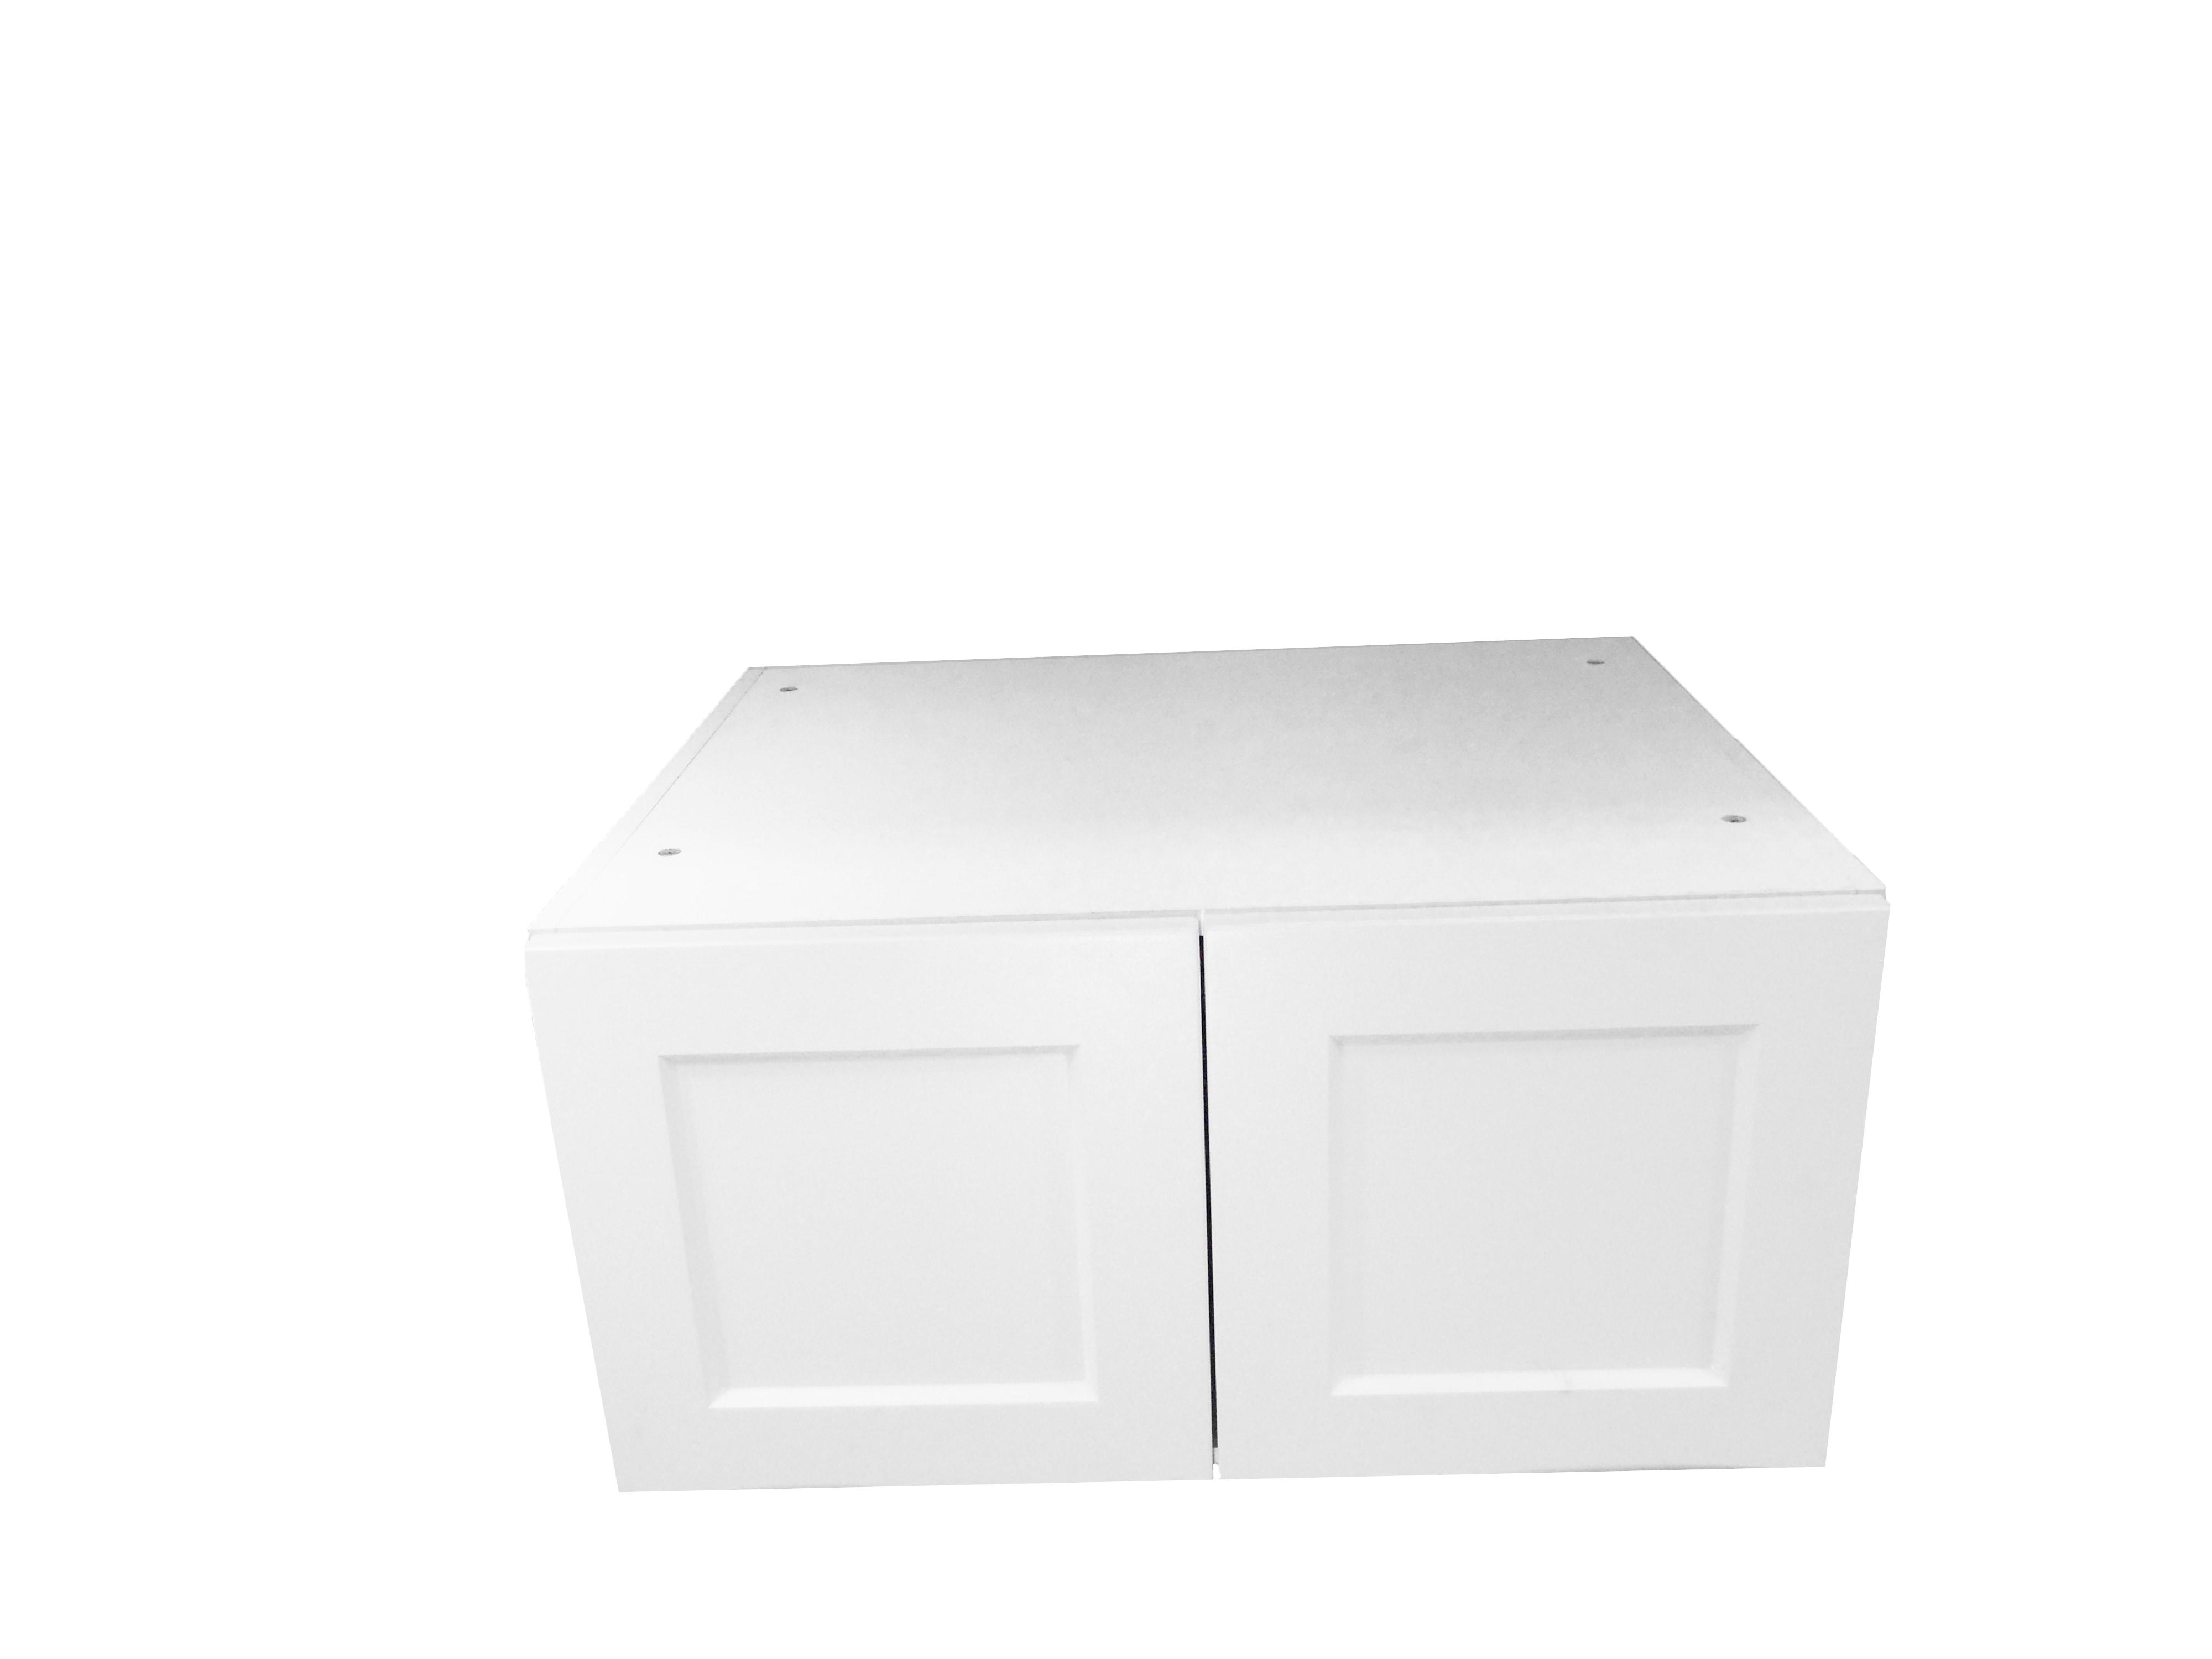 Deep Appliance Wall Cabinet / Wistler White / Flat Panel White / 33x15x24 Whistler White 0